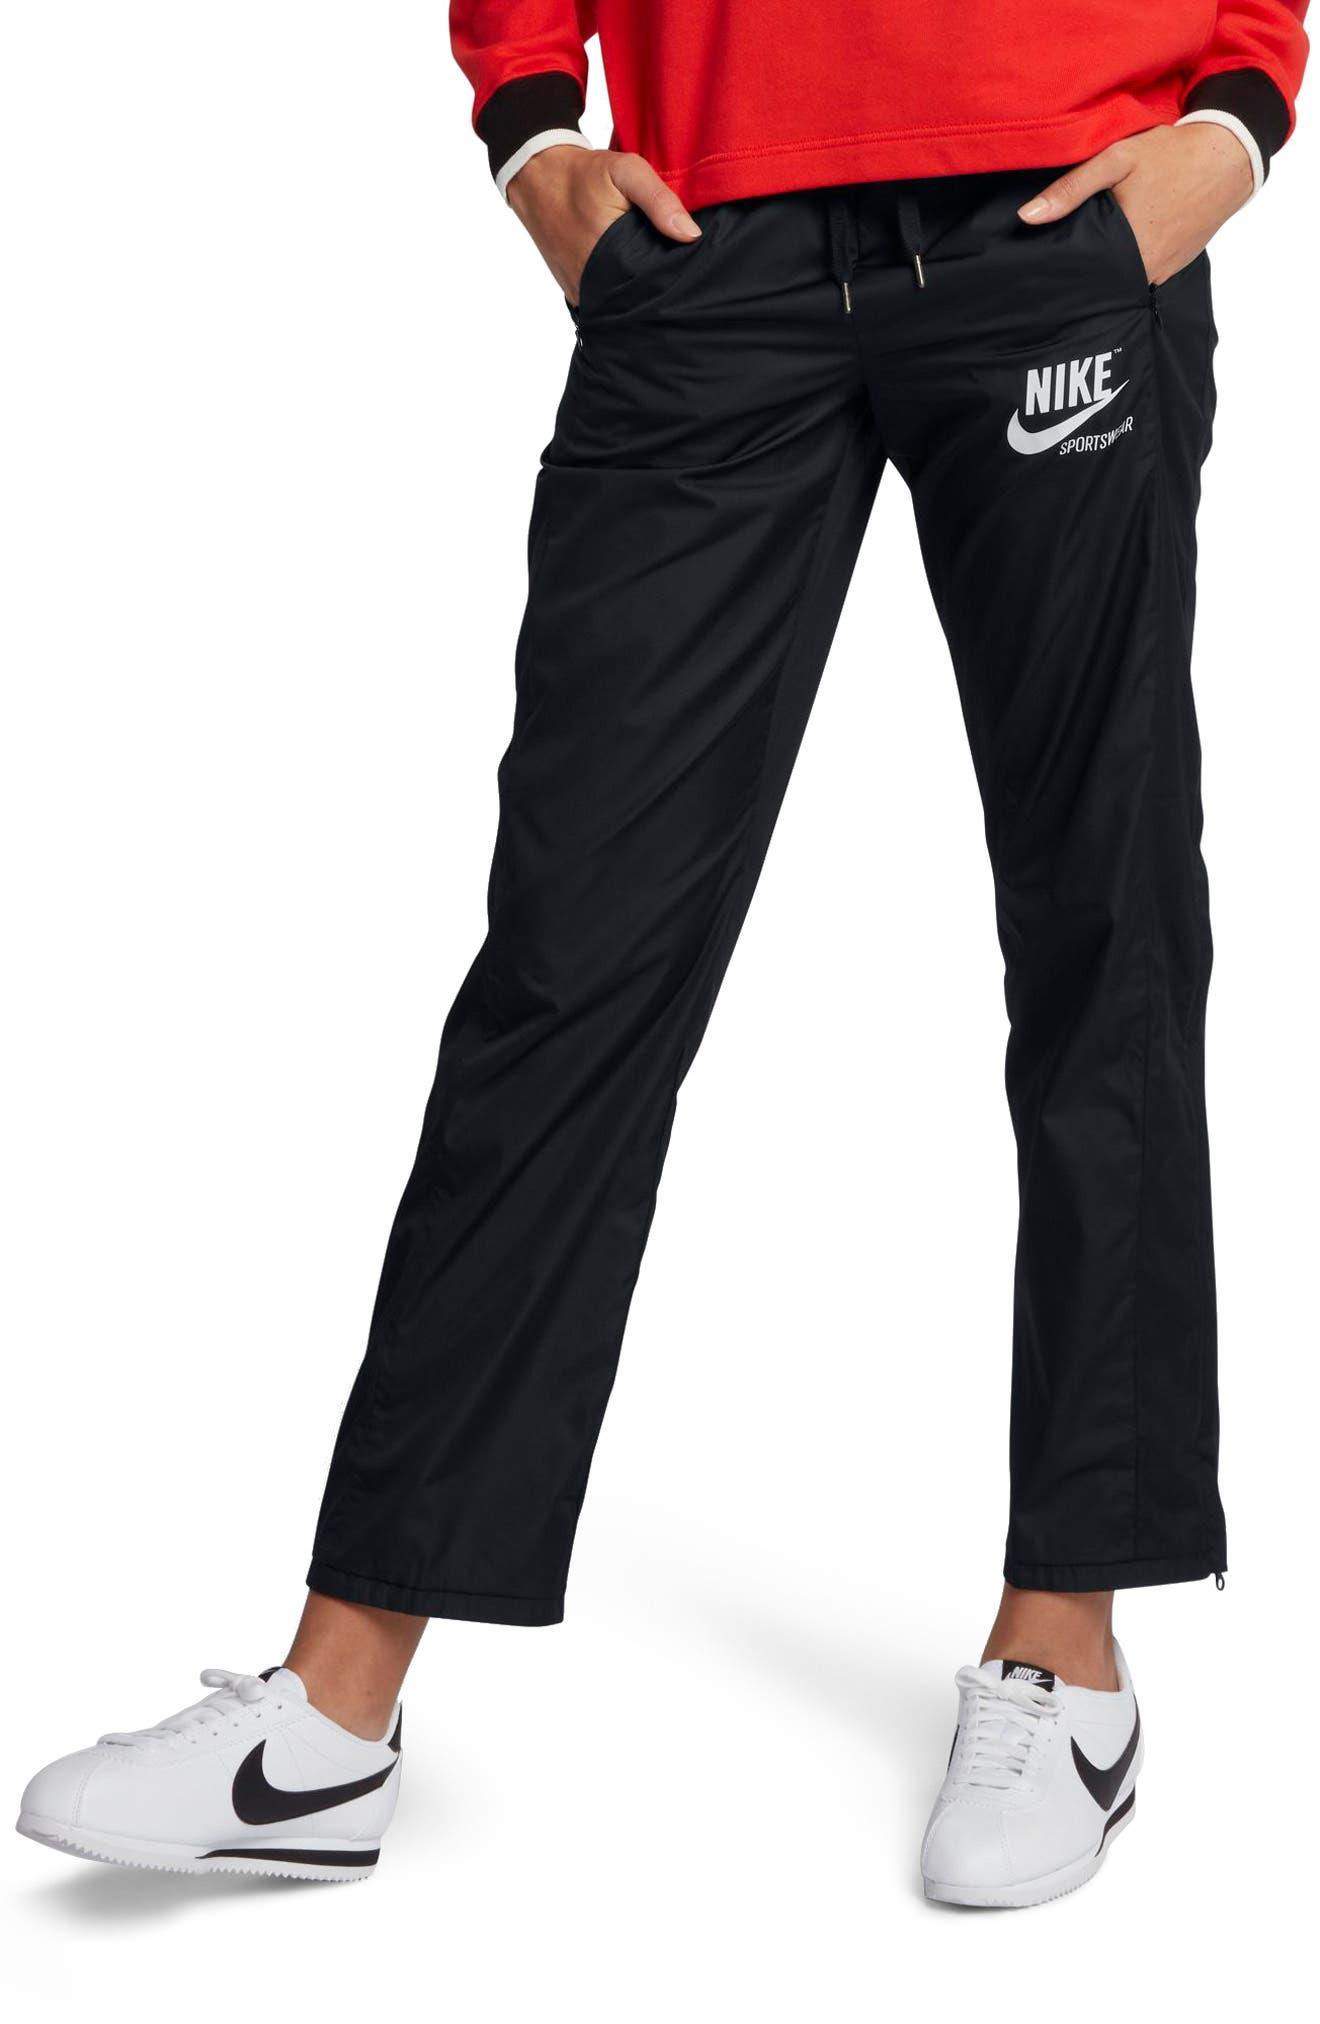 Alternate Image 1 Selected - Nike Sportswear Women's Stretch Faille Pants